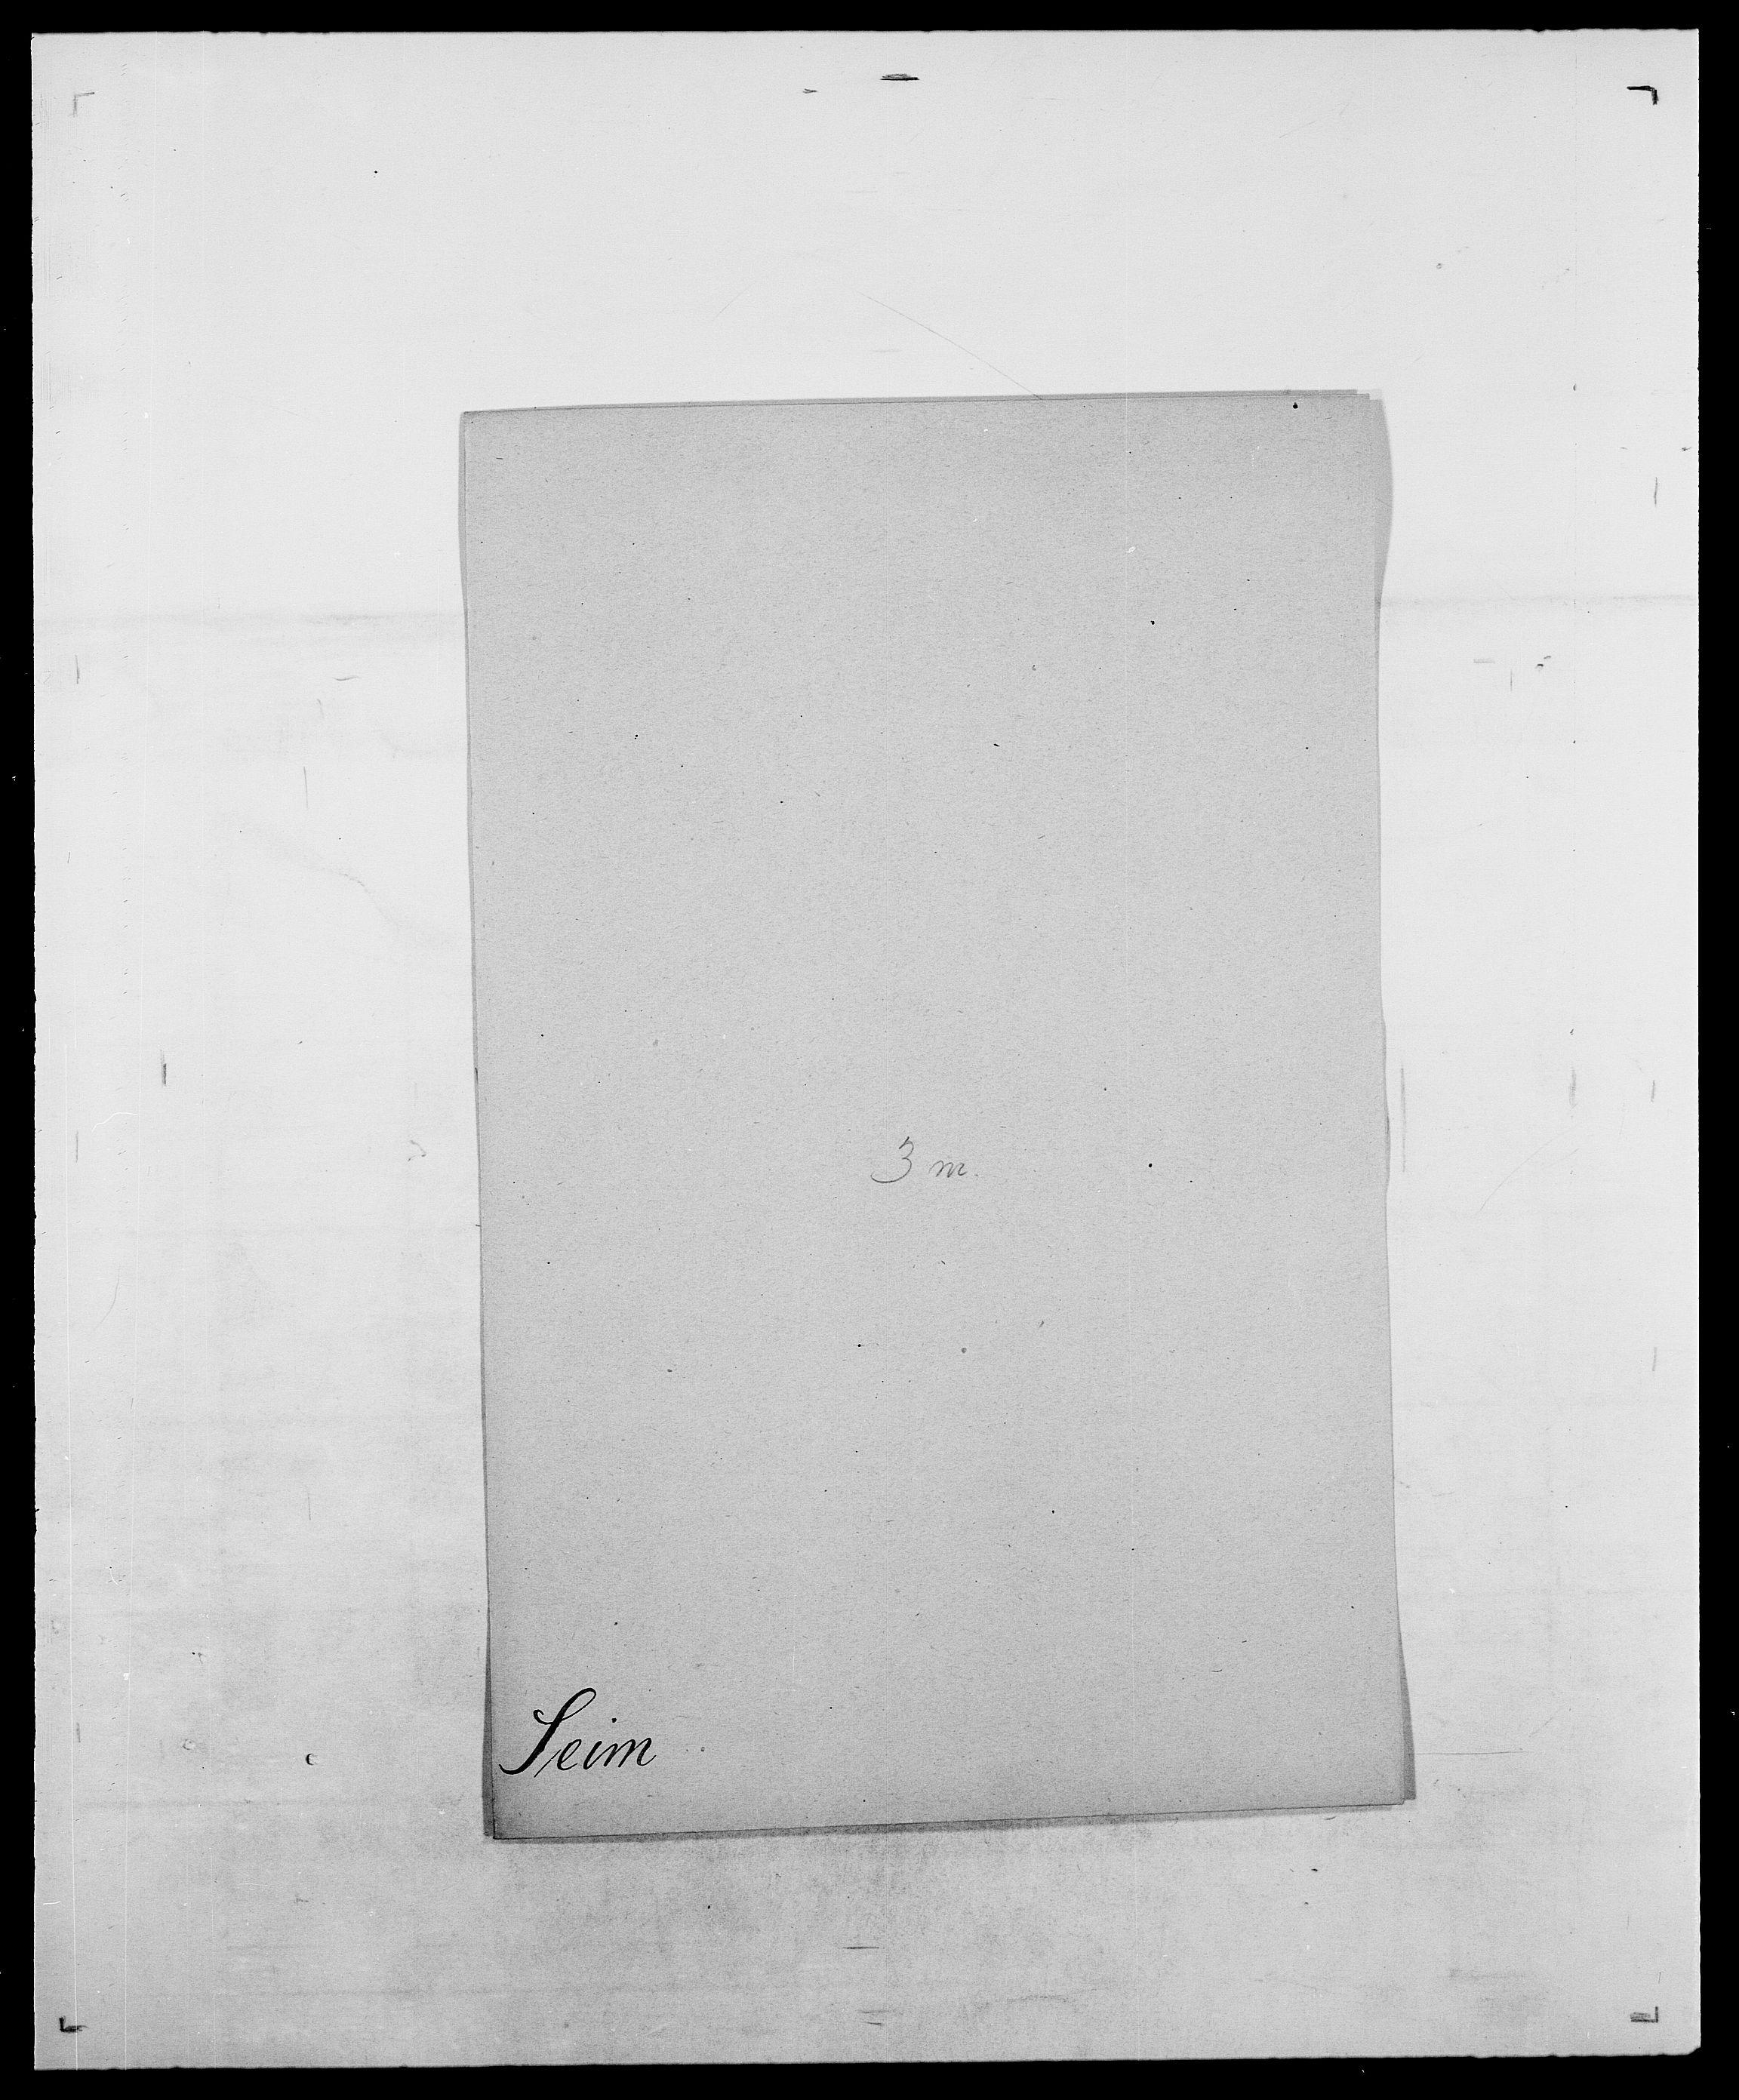 SAO, Delgobe, Charles Antoine - samling, D/Da/L0035: Schnabel - sjetman, s. 605